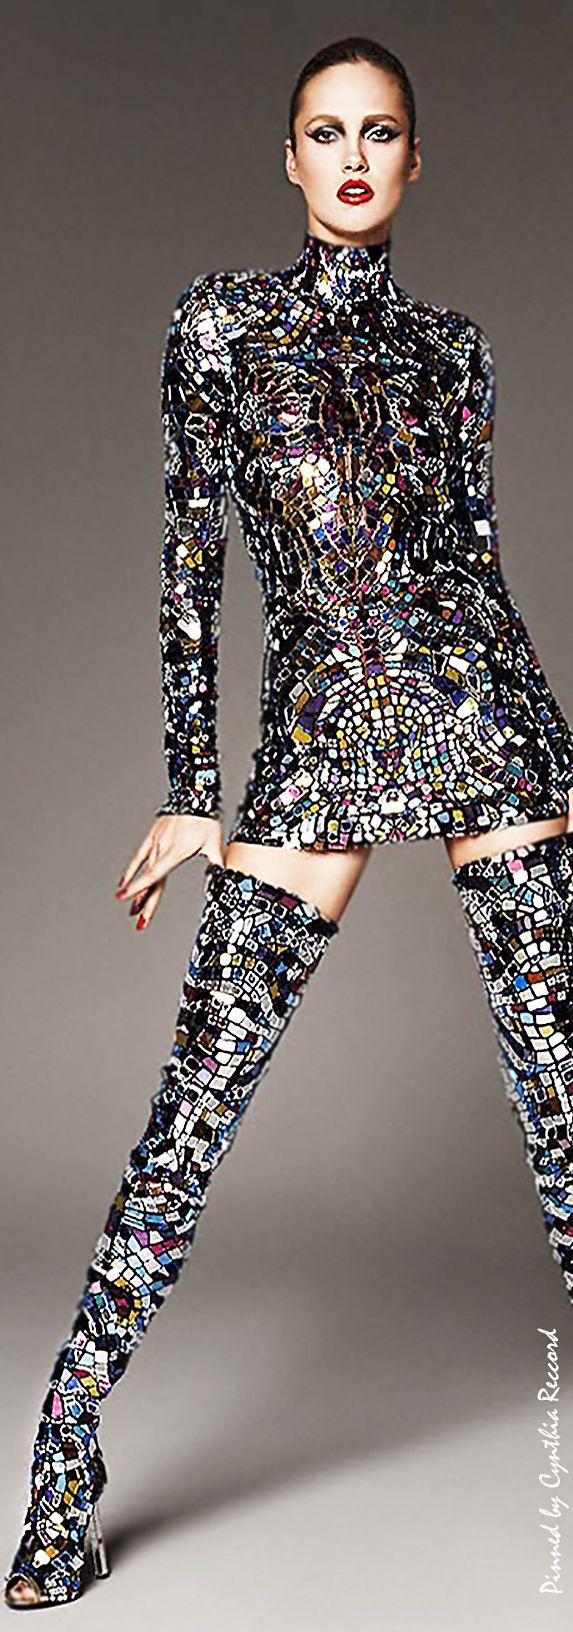 Karmen Pedaru in Tom Ford's Multicolor broken-mirror Mini Dress & Thigh-High Boots SS 2014 | cynthia reccord